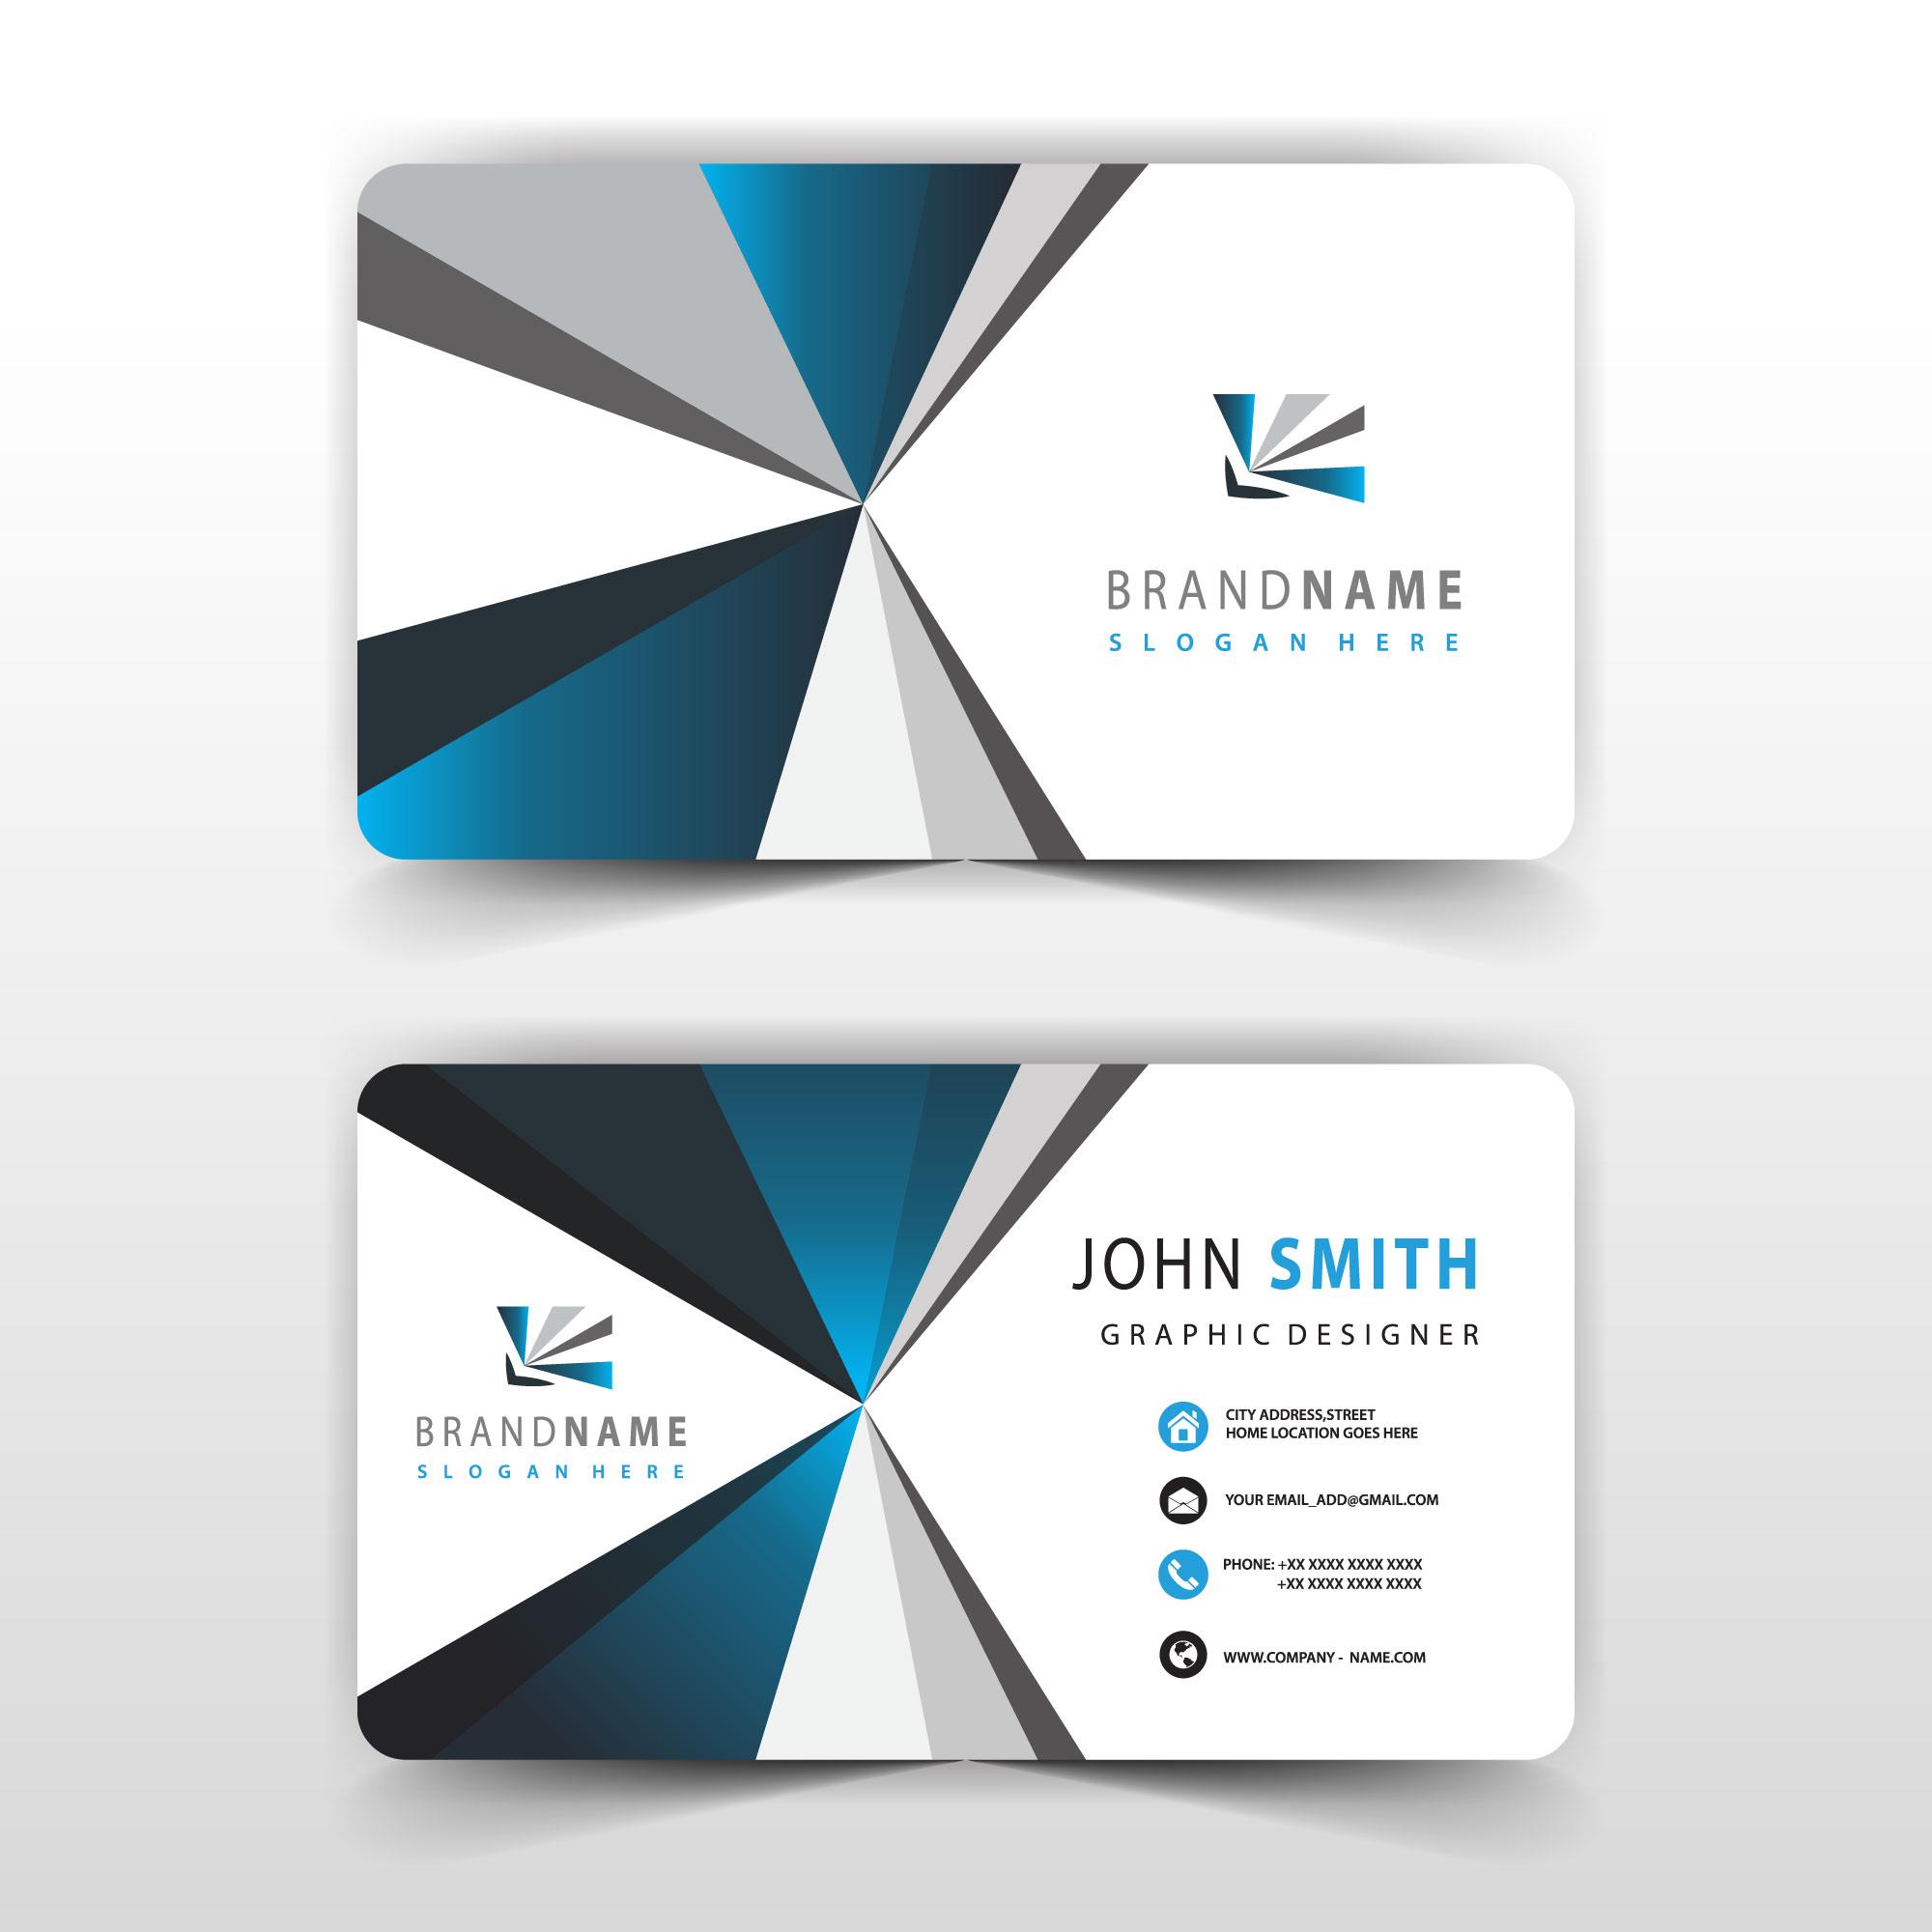 Graphic Designer Visiting Card Free